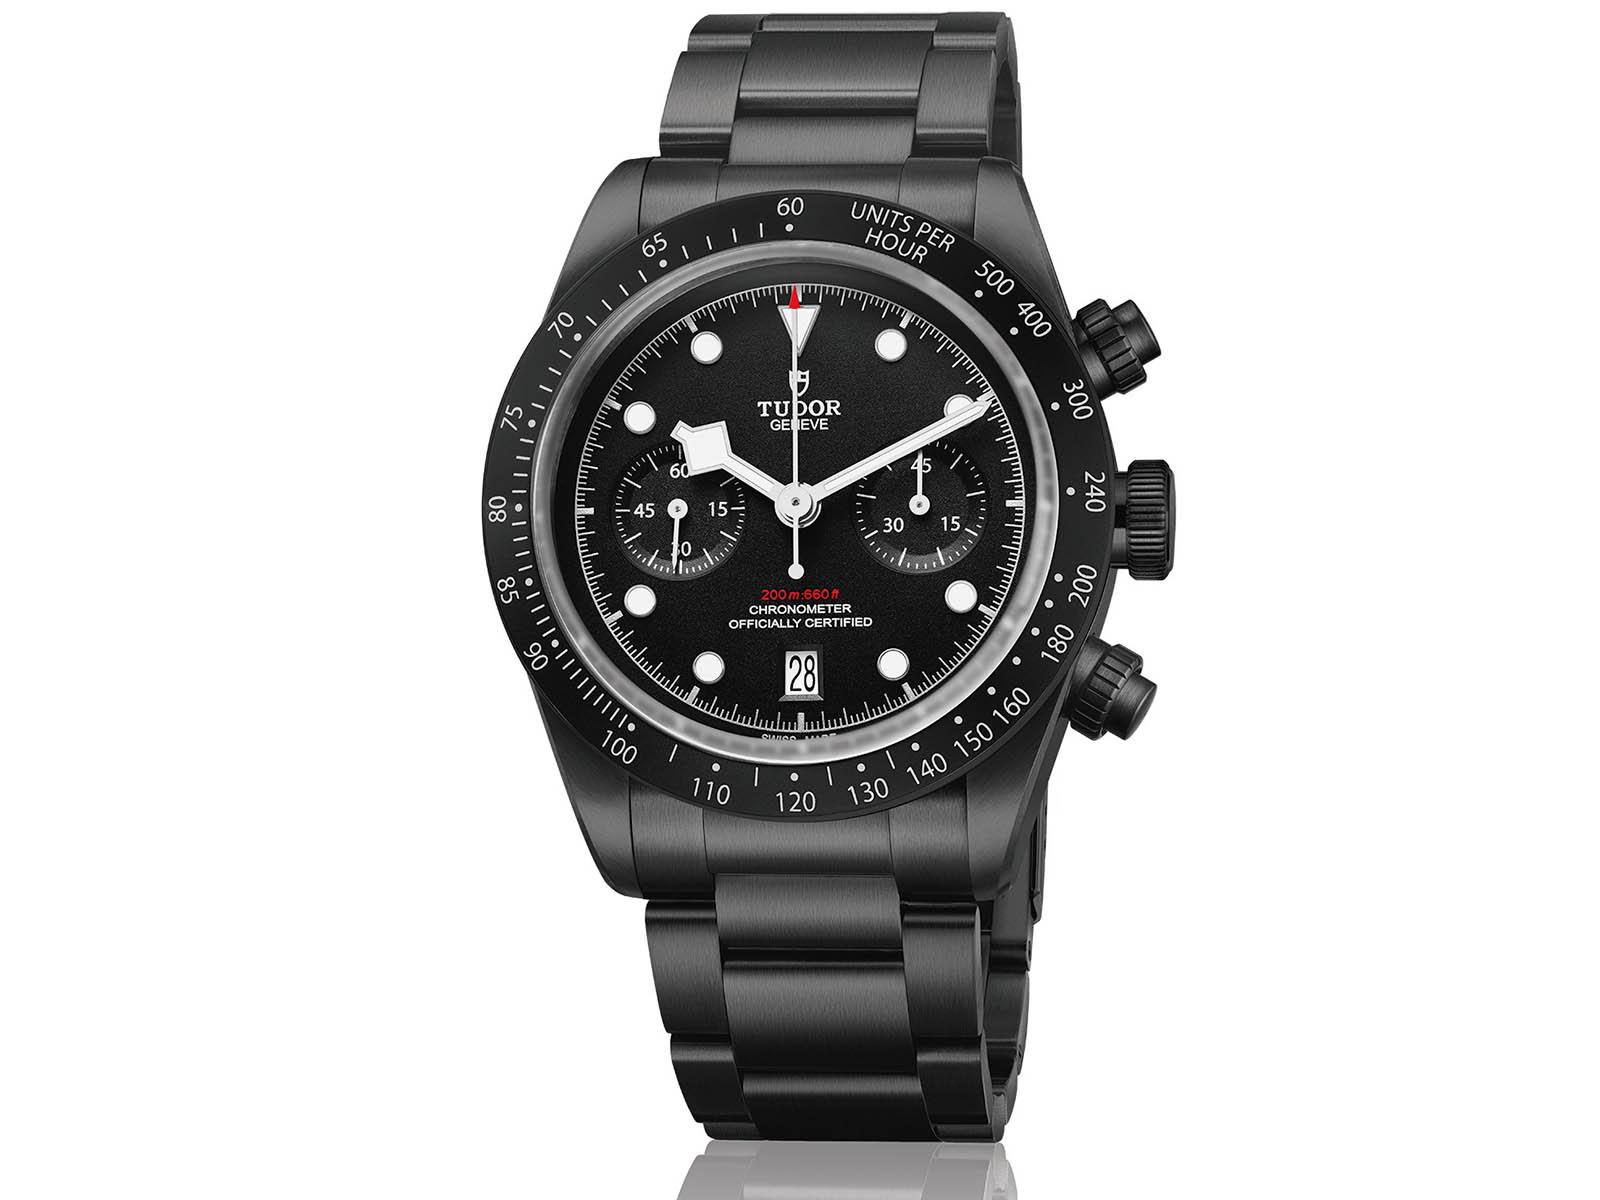 79360dk-tudor-black-bay-chrono-dark-limited-edition-4.jpg